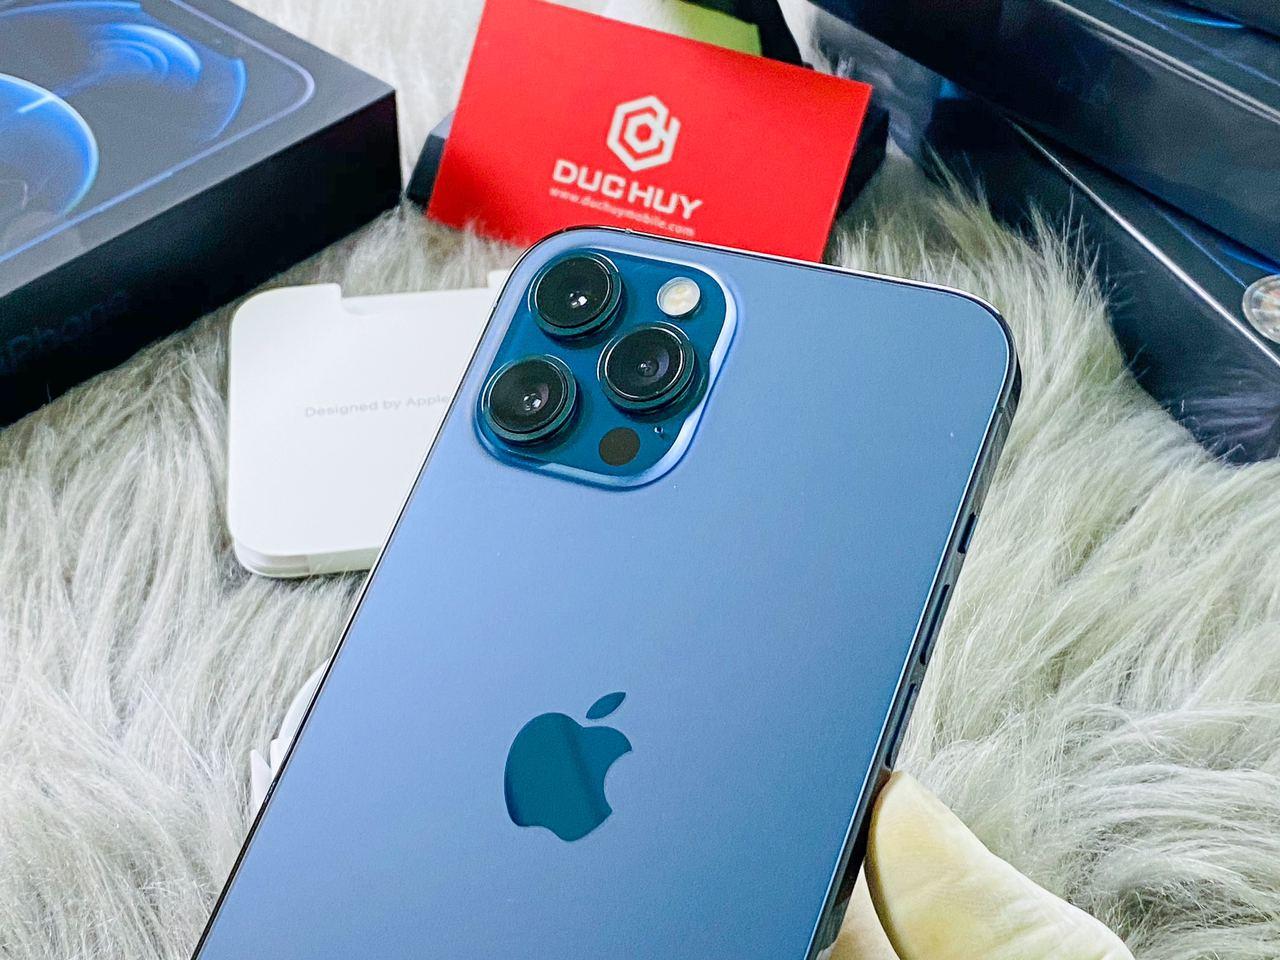 camera iphone 12 pro max 256gb